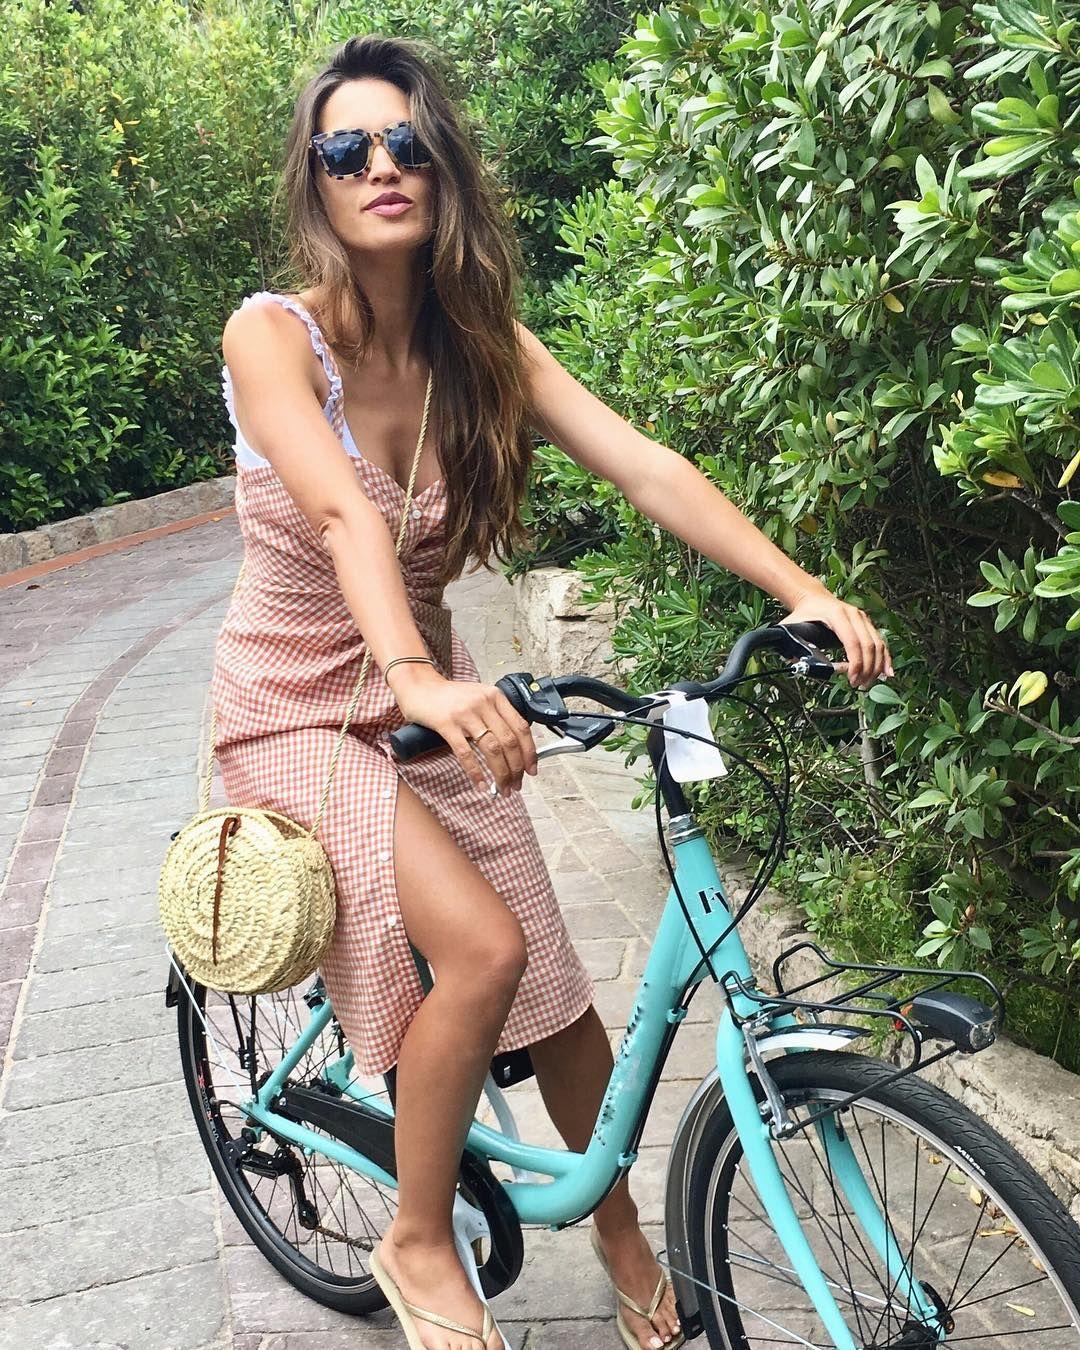 Sara De Los Looks Carbonero Outlet Mango oerxBECWQd